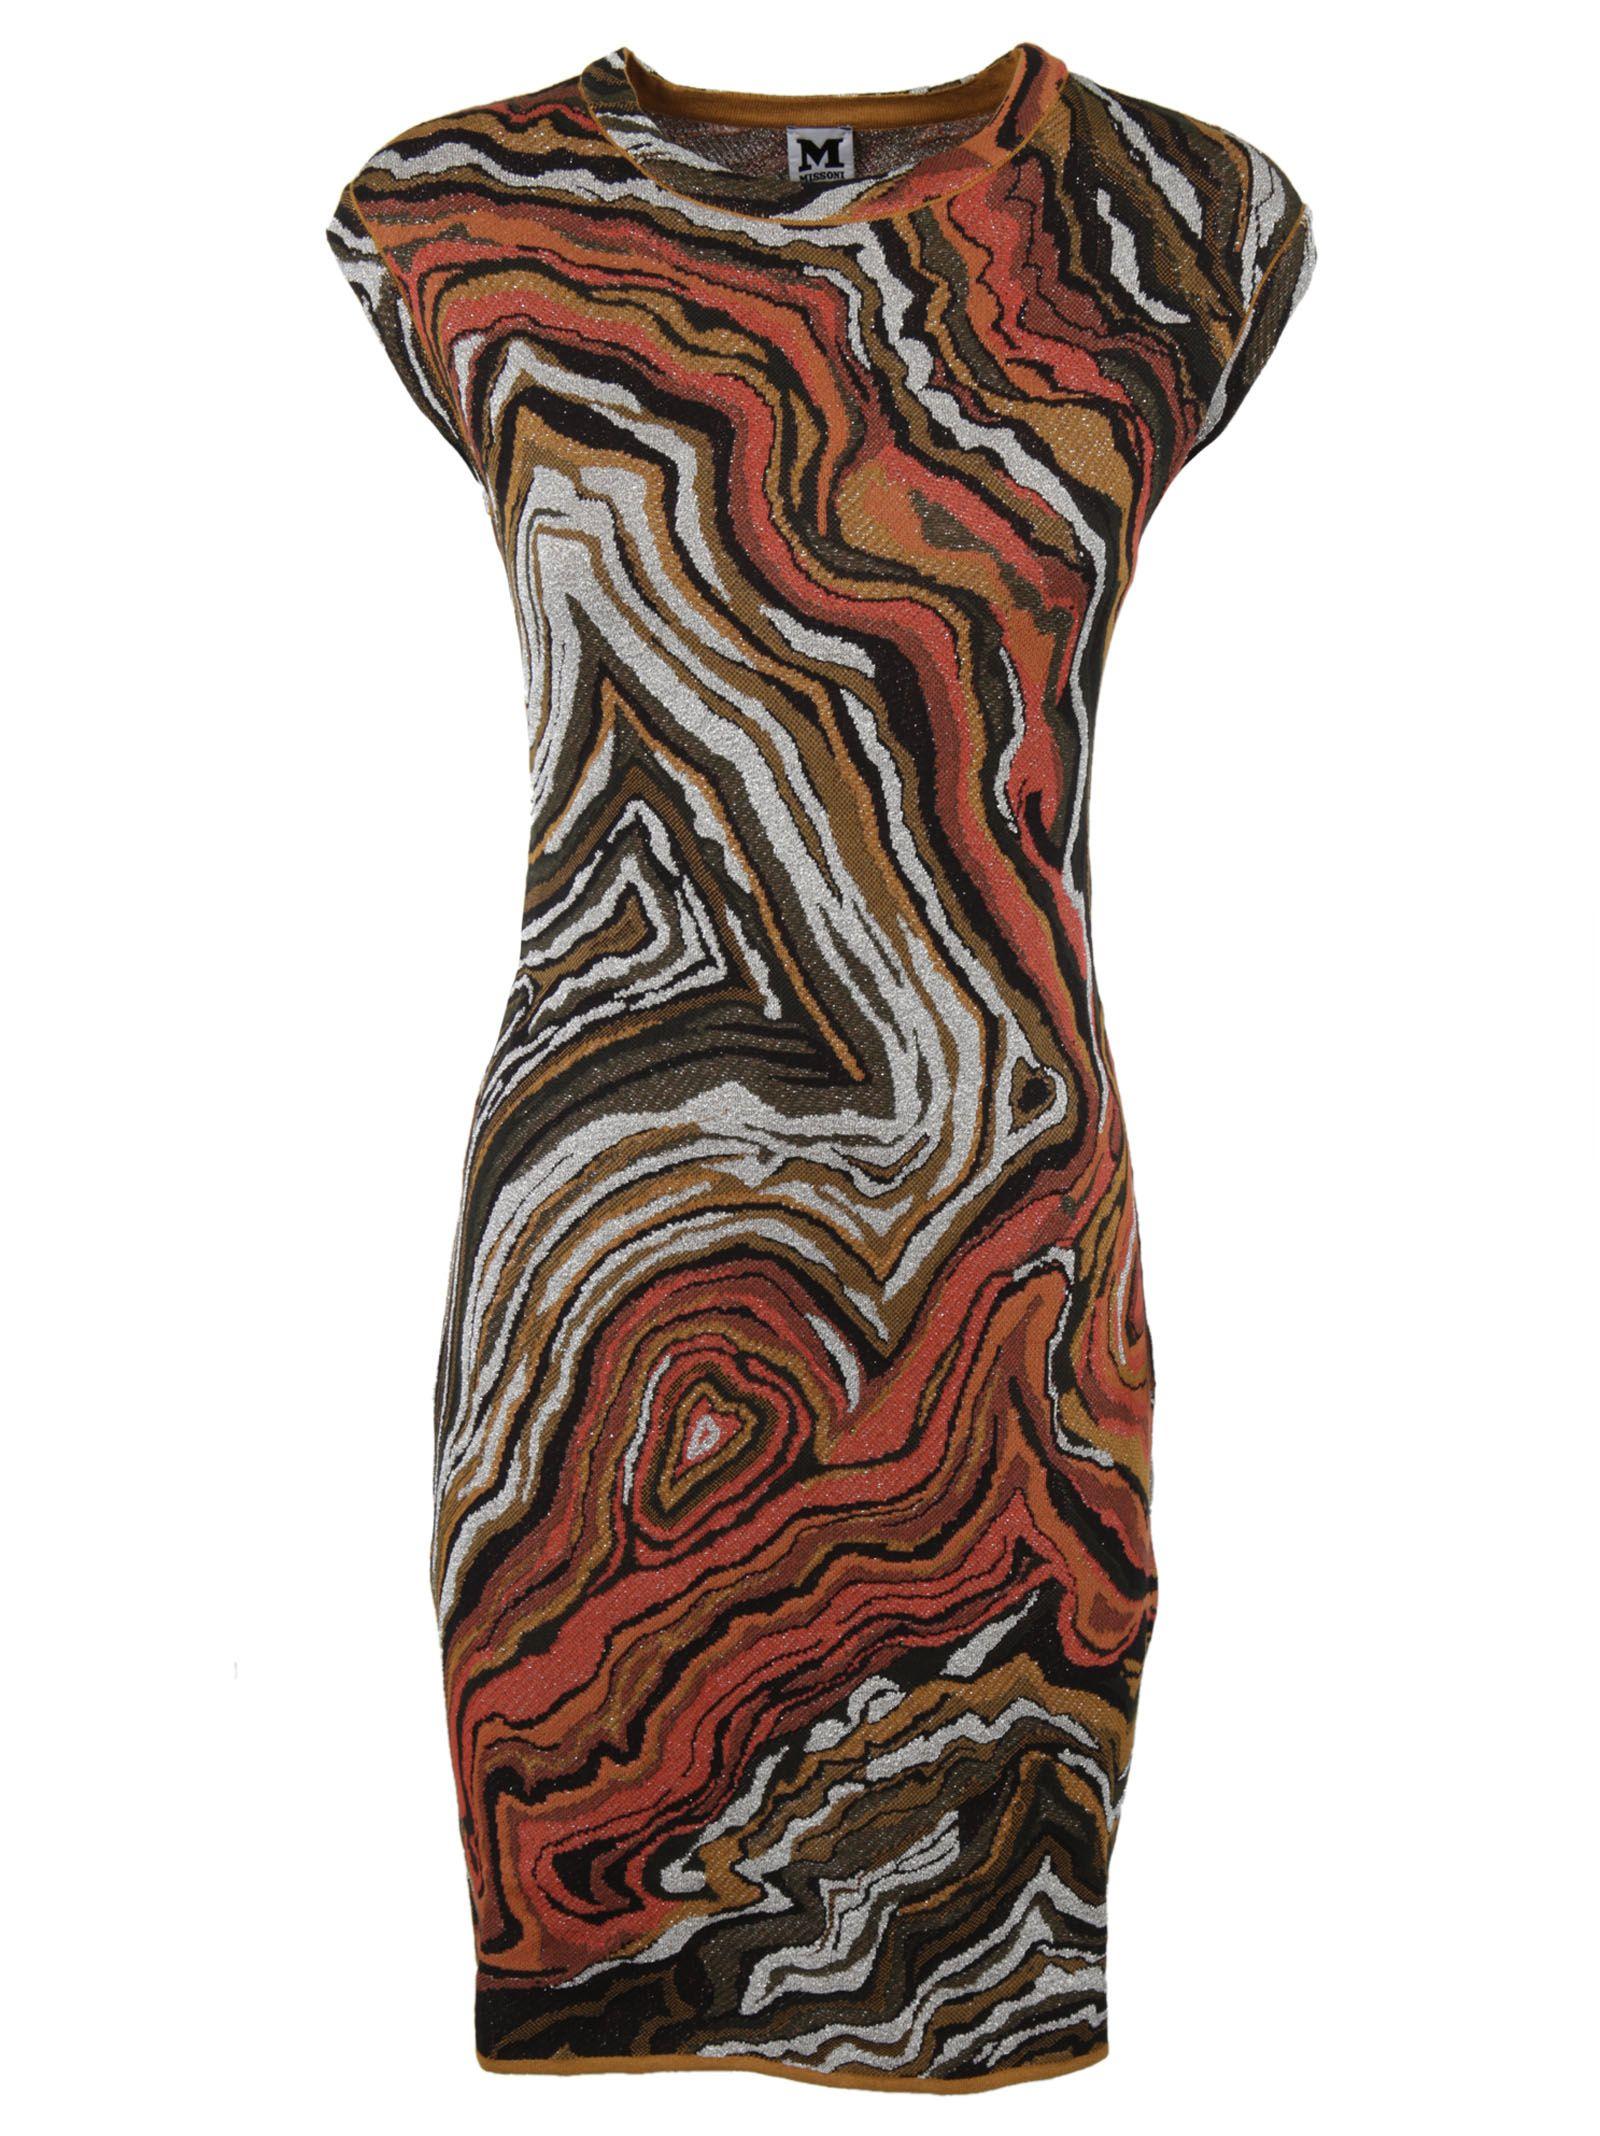 Missoni Abstract Print Dress